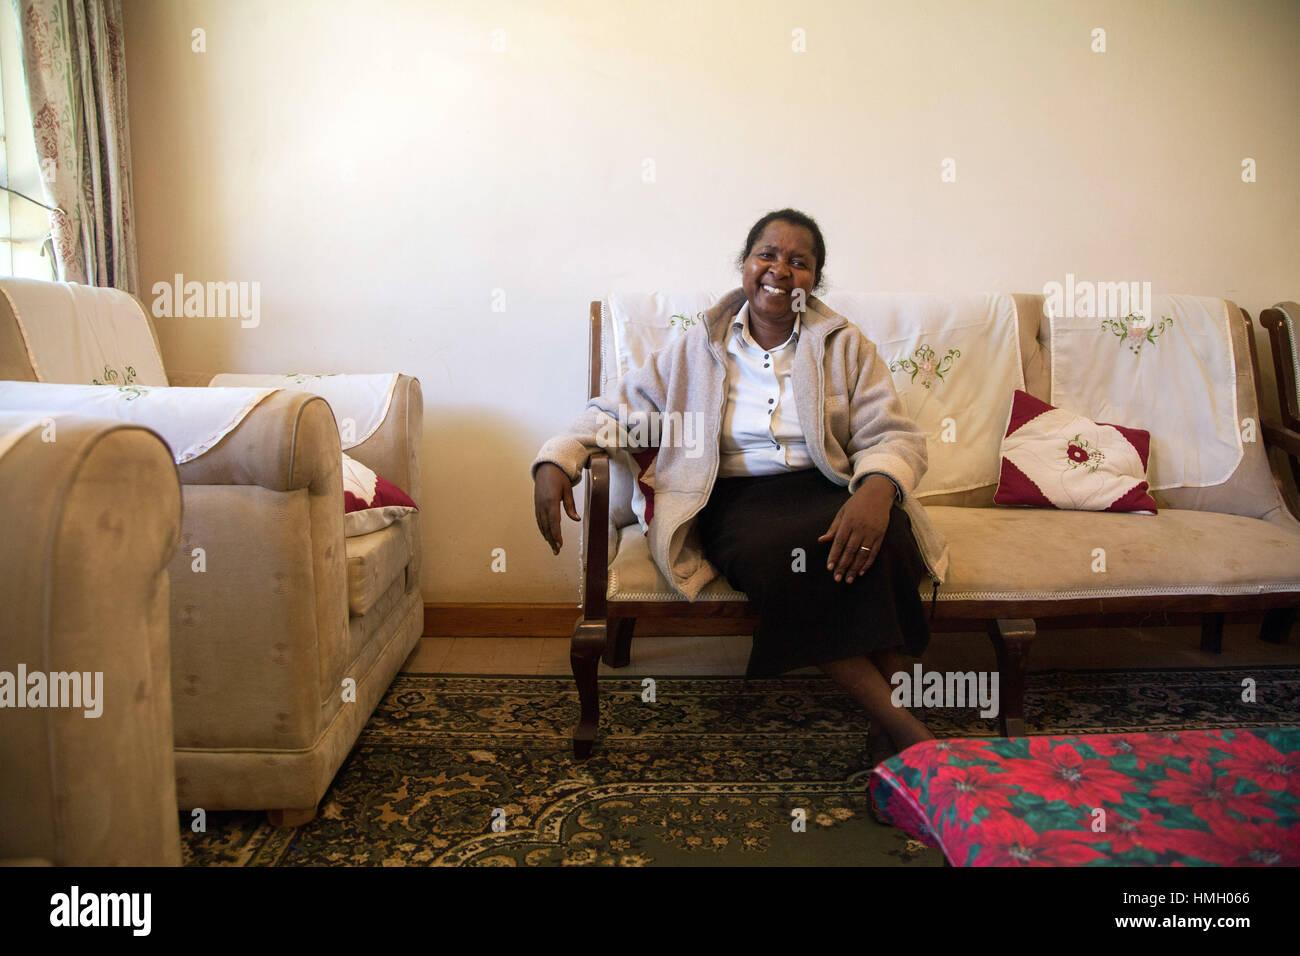 Nairobi, Kenya. 11th Jan, 2017. Ephigenia Gachiri sits in the Catholic Loreto abbey in Nairobi, Kenya, 11 January - Stock Image